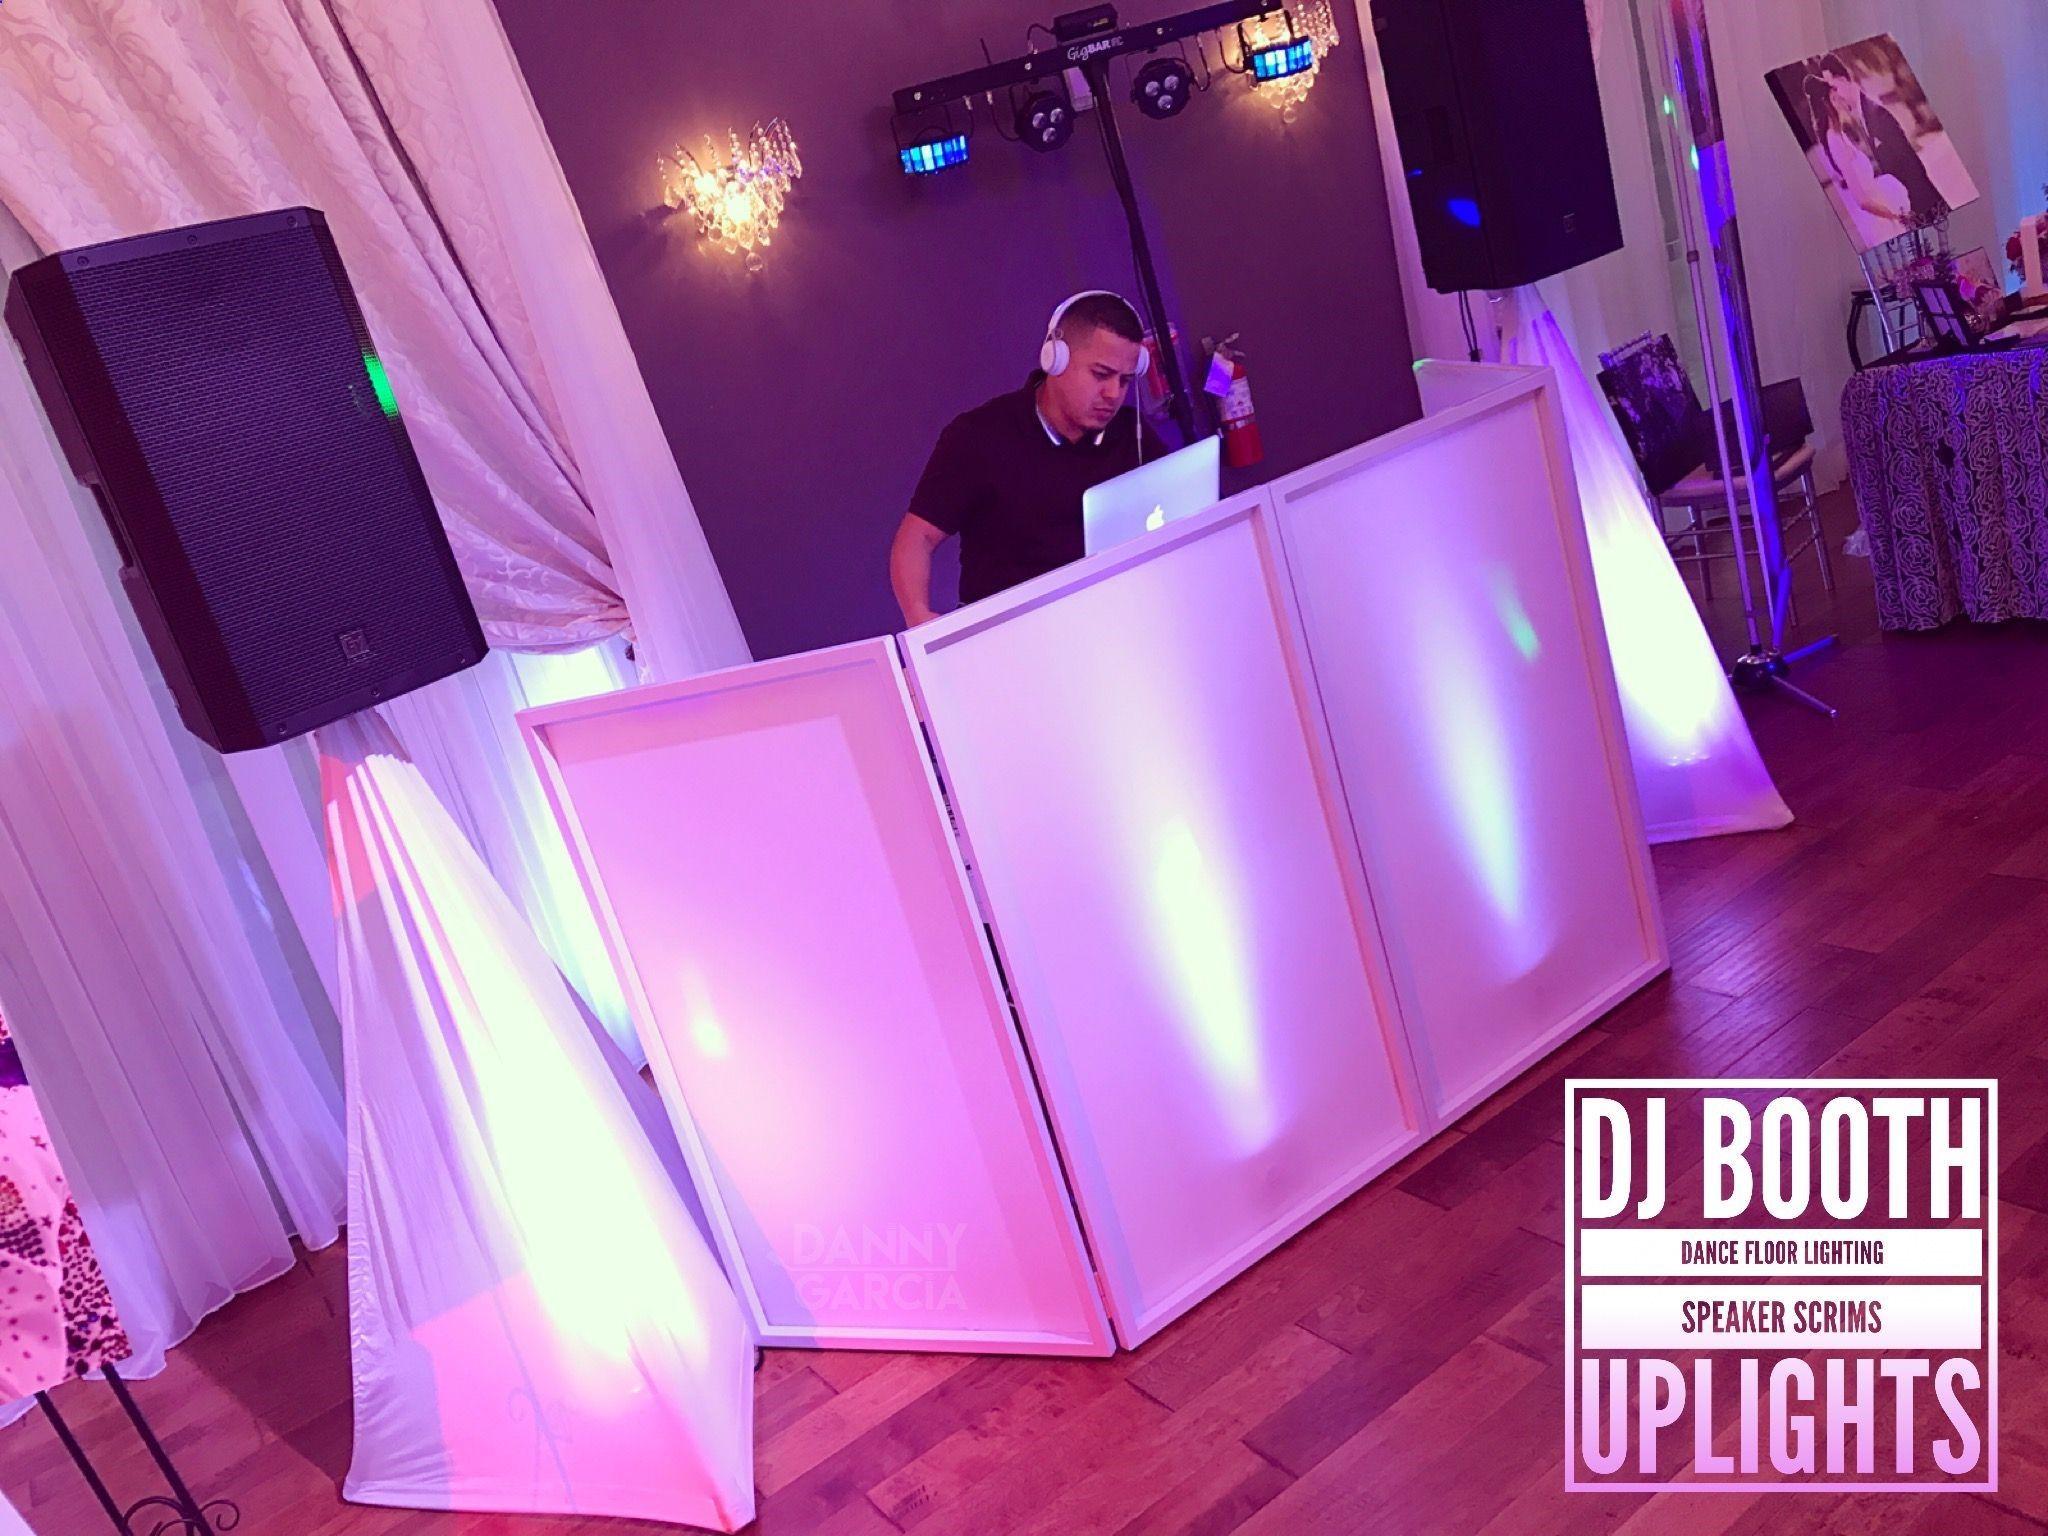 Dj Booth Setup For Weddings Uplights Speaker Scrims Dance Floor Lighting Www Djdannygarcia Wedding Dj Setup Dj Booth Wedding Dj Booth